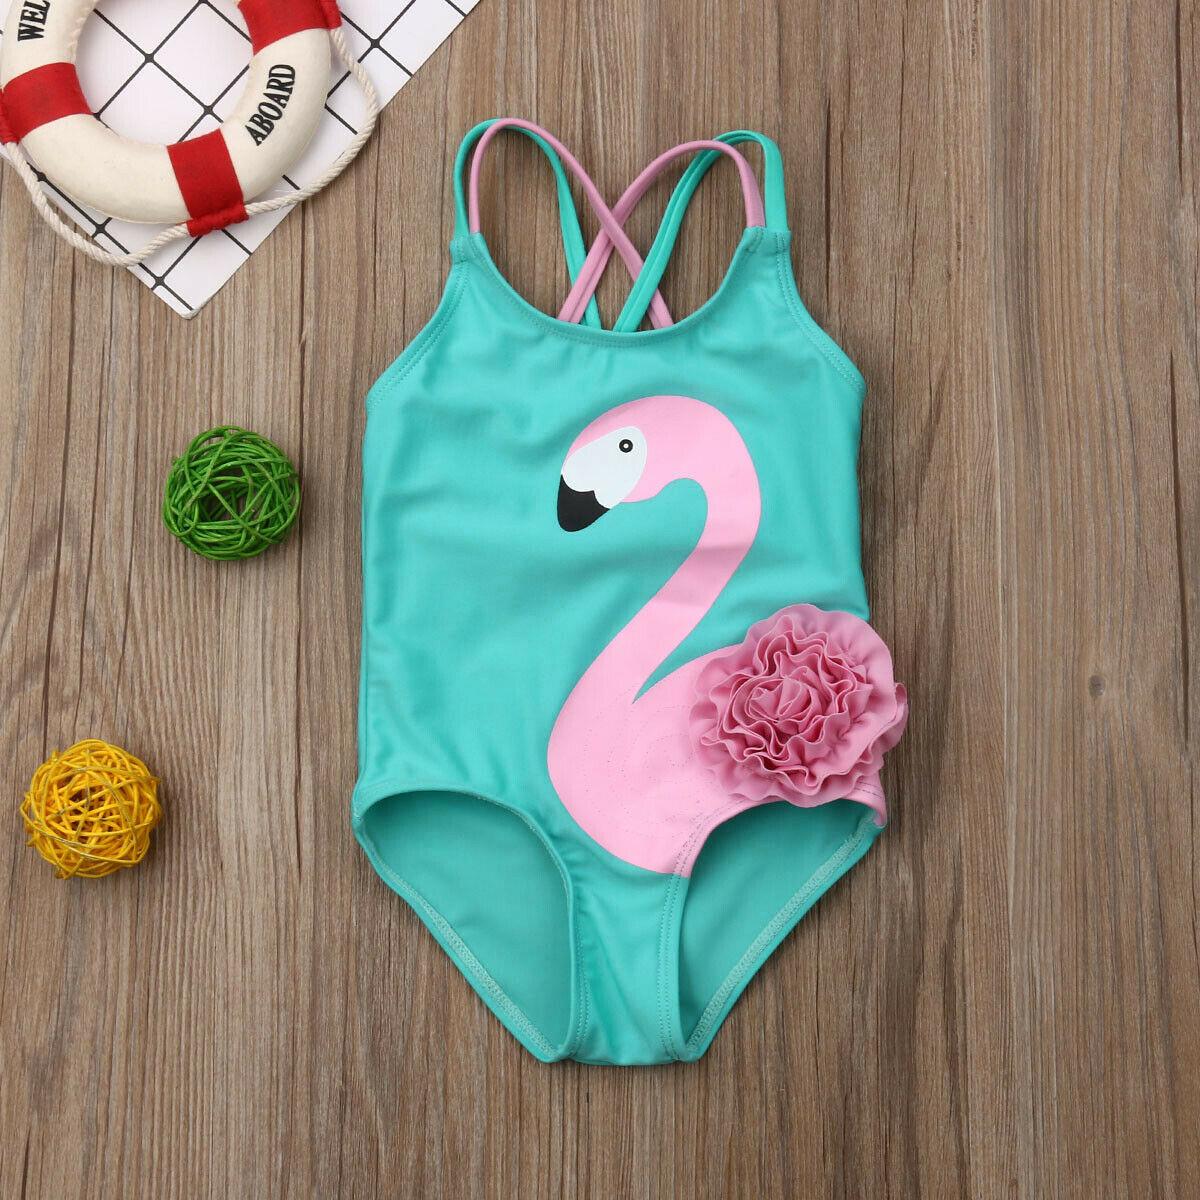 Toddler Kids Baby Girls Flamingo Sleeveless Bikini Swimwear Swimsuit Beachwear Bathing Suit|Clothing Sets| |  - title=